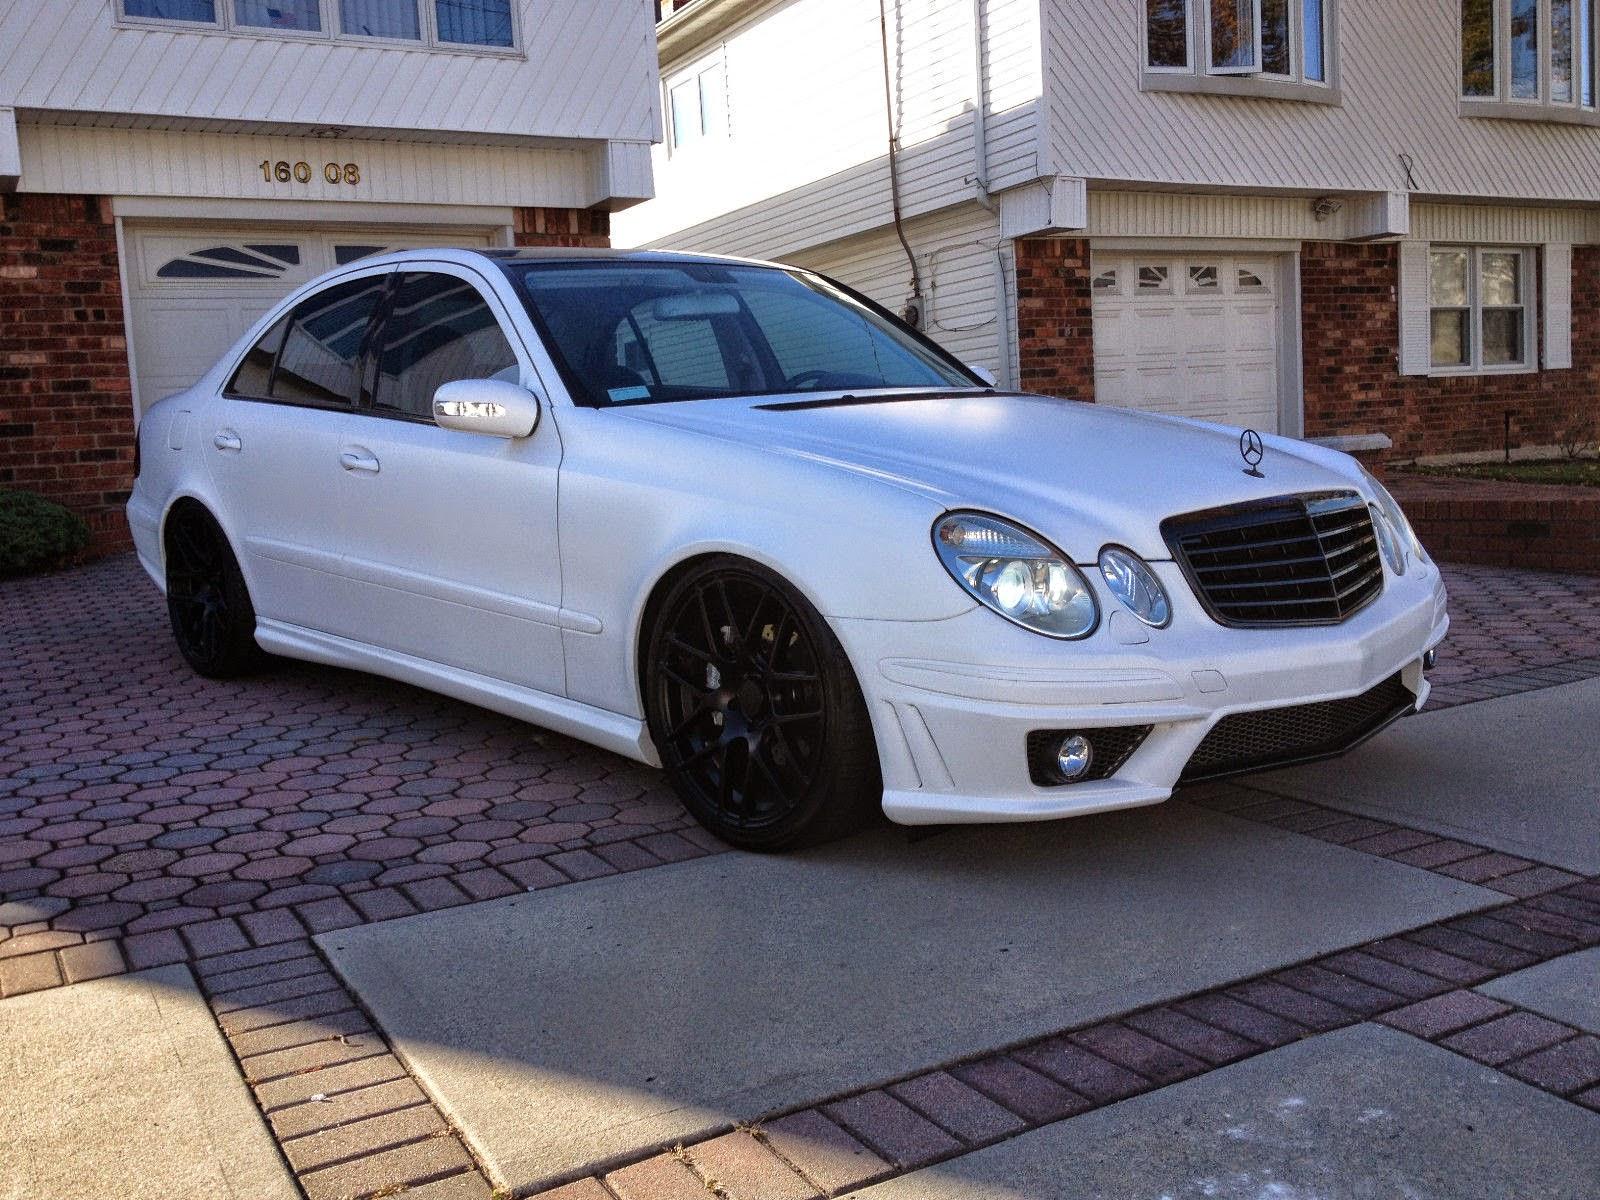 buyers_guide_-_mercedes_cls_2014_-_front_quarter Mercedes Benz Cls 320 02